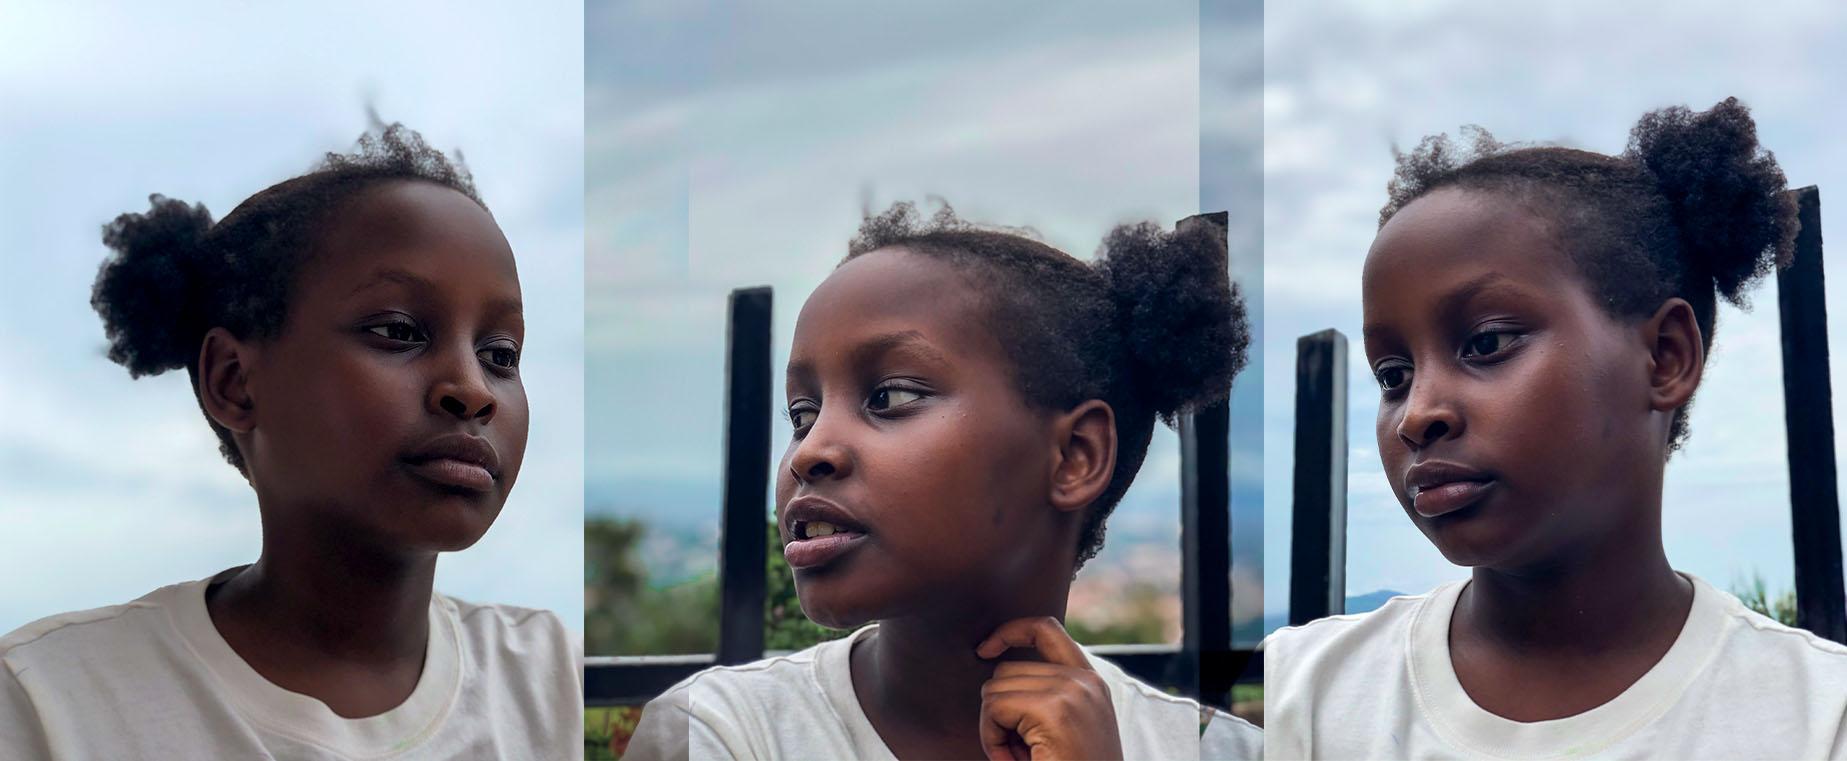 black children,Rwanda,innocence